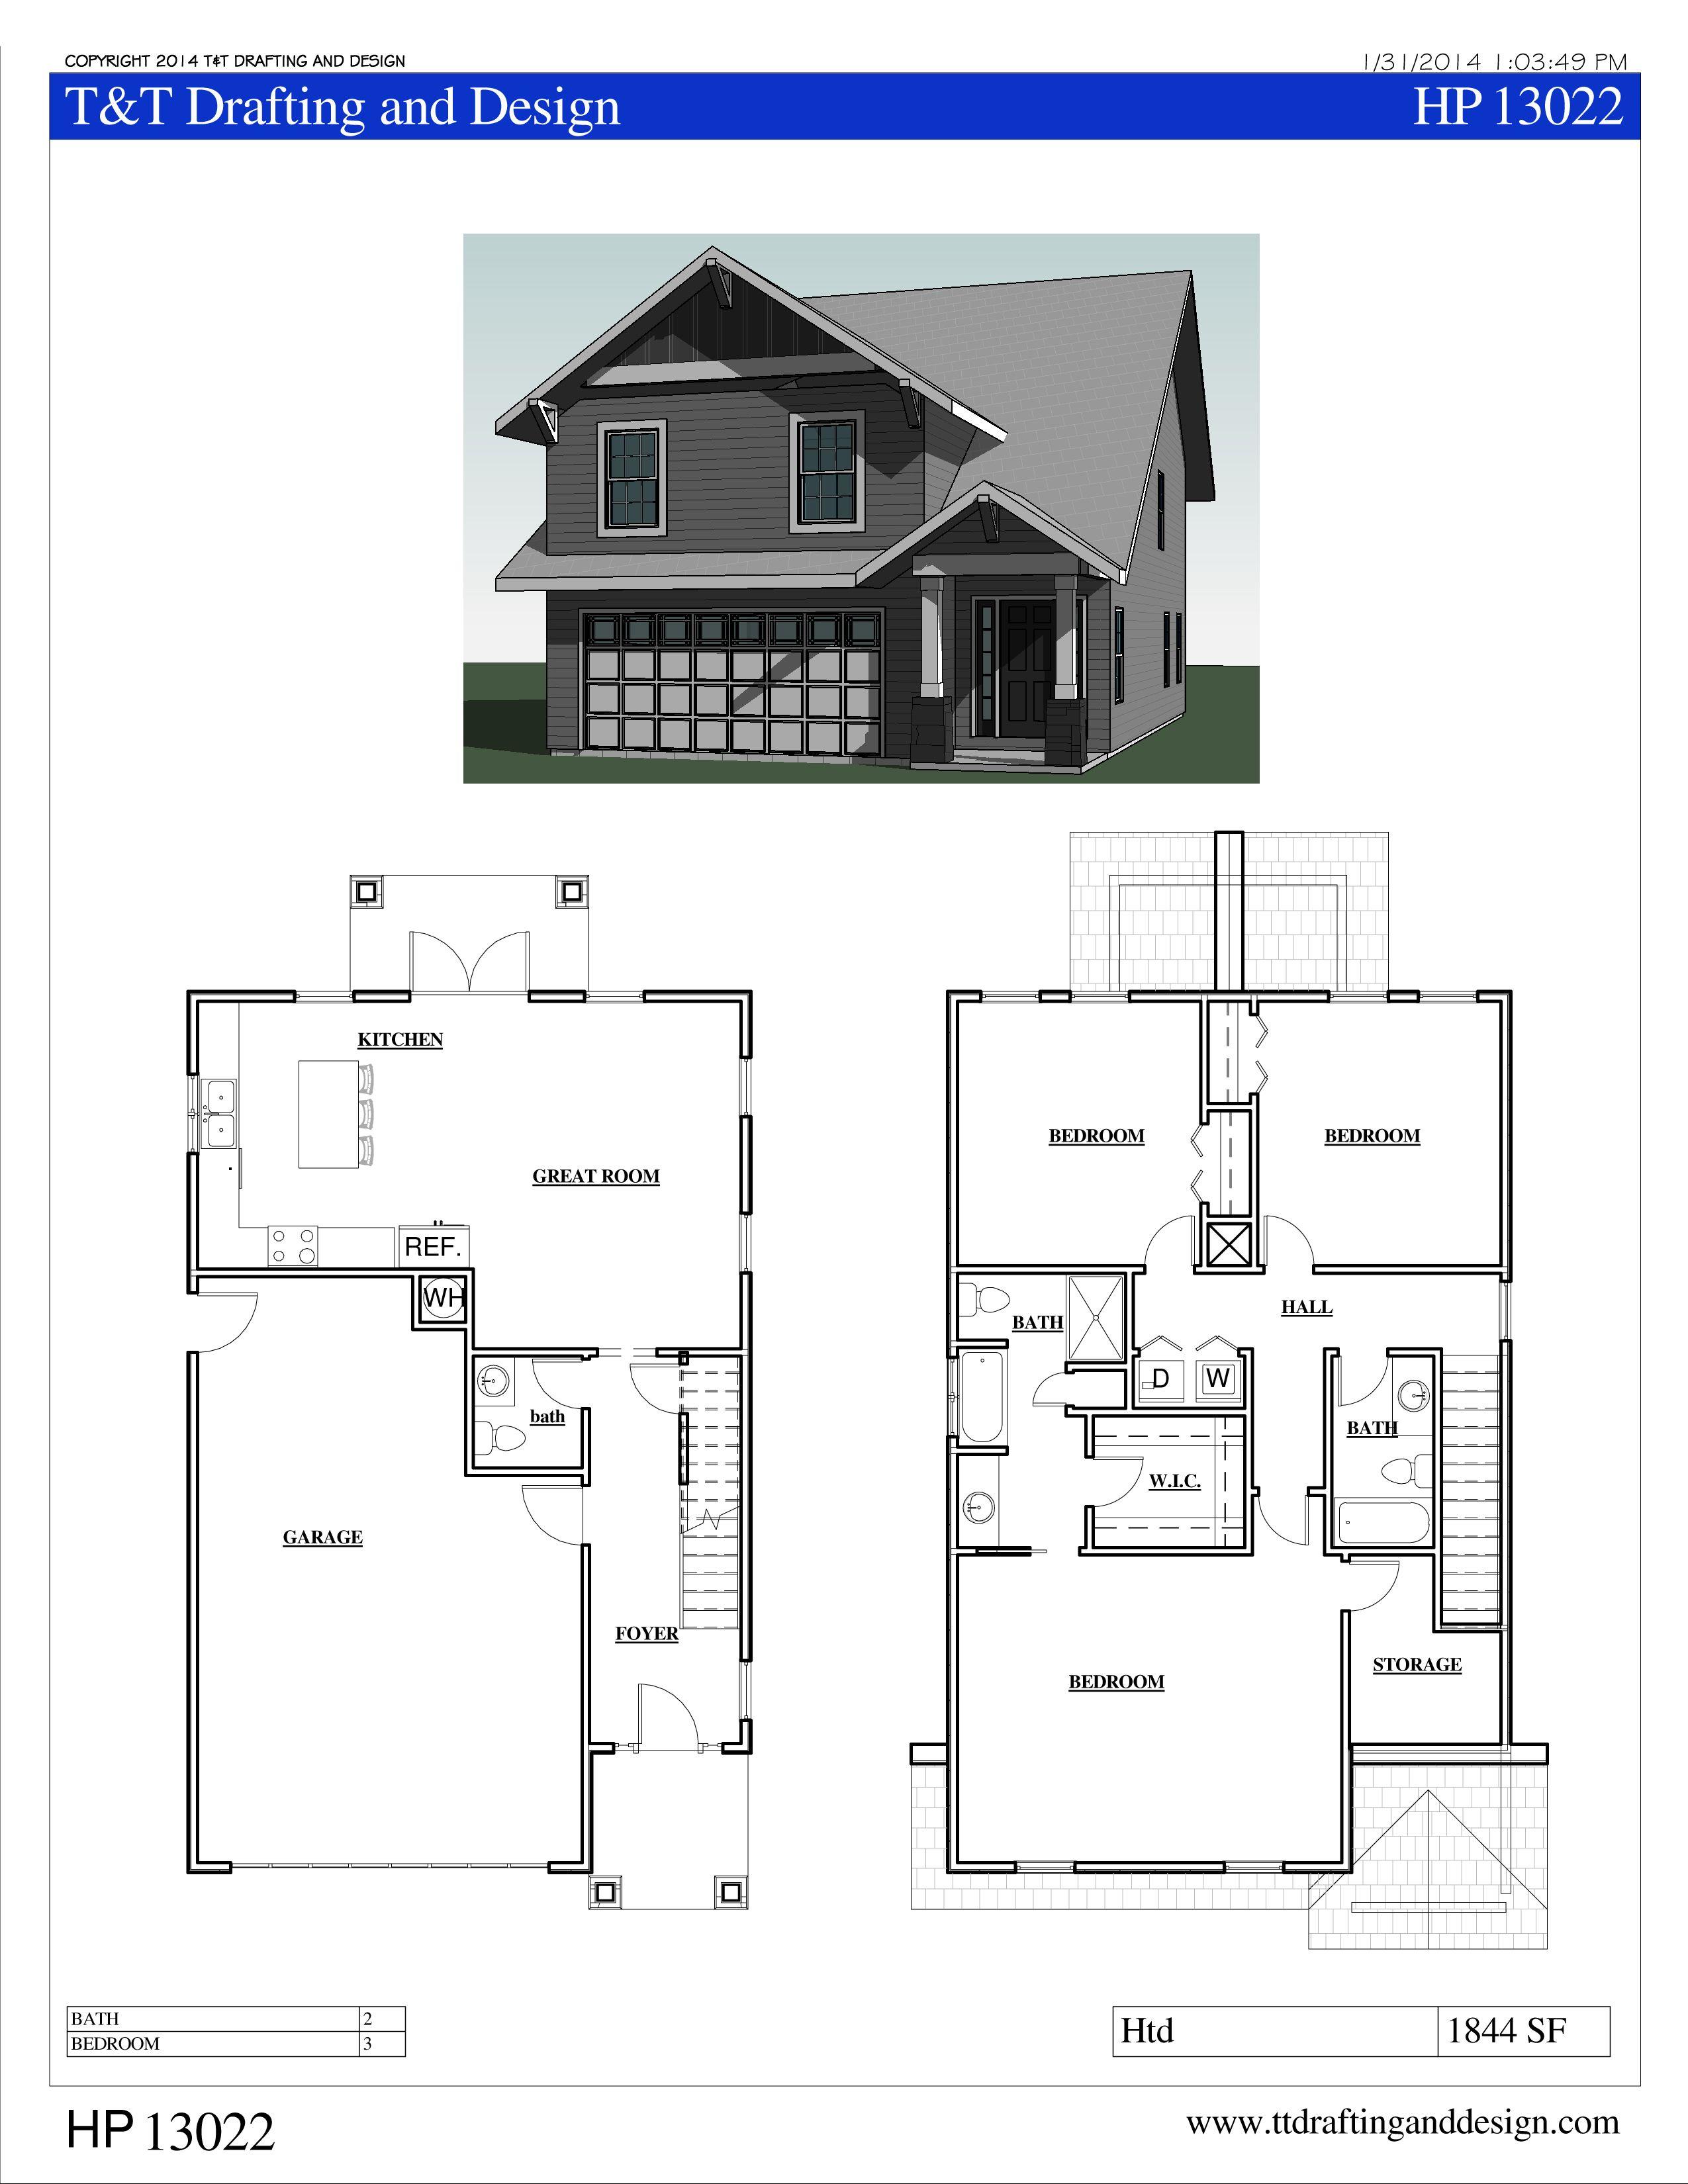 Ttd13022 House Plan 3 Bedroom 2 1 2 Bath House Plans Floor